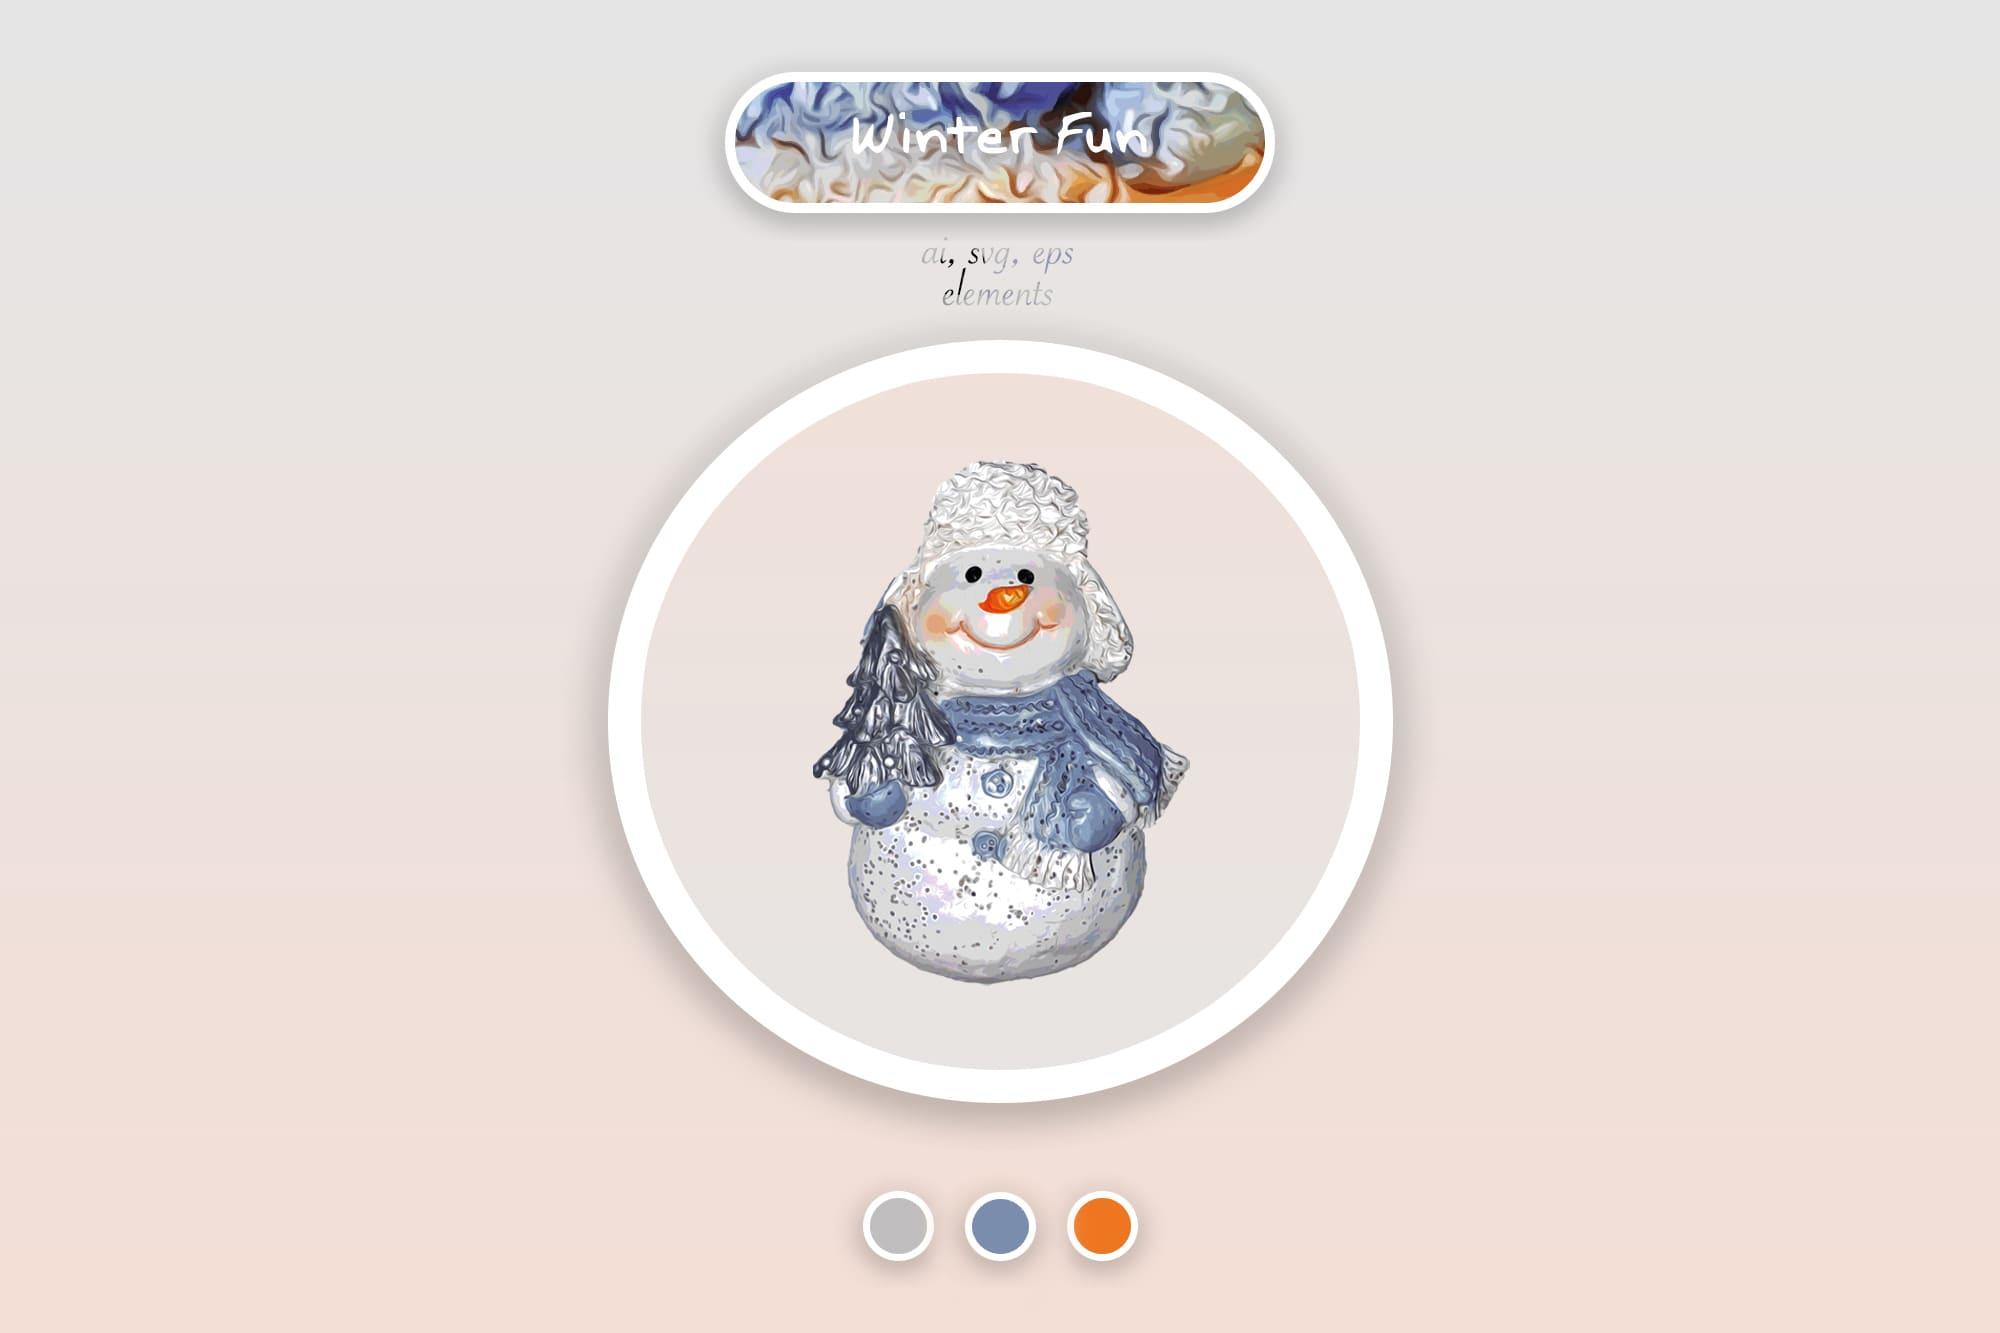 496 Christmas Illustrations: Christmas Vectors Bundle SVG, EPS, AI - Winter fun 1a